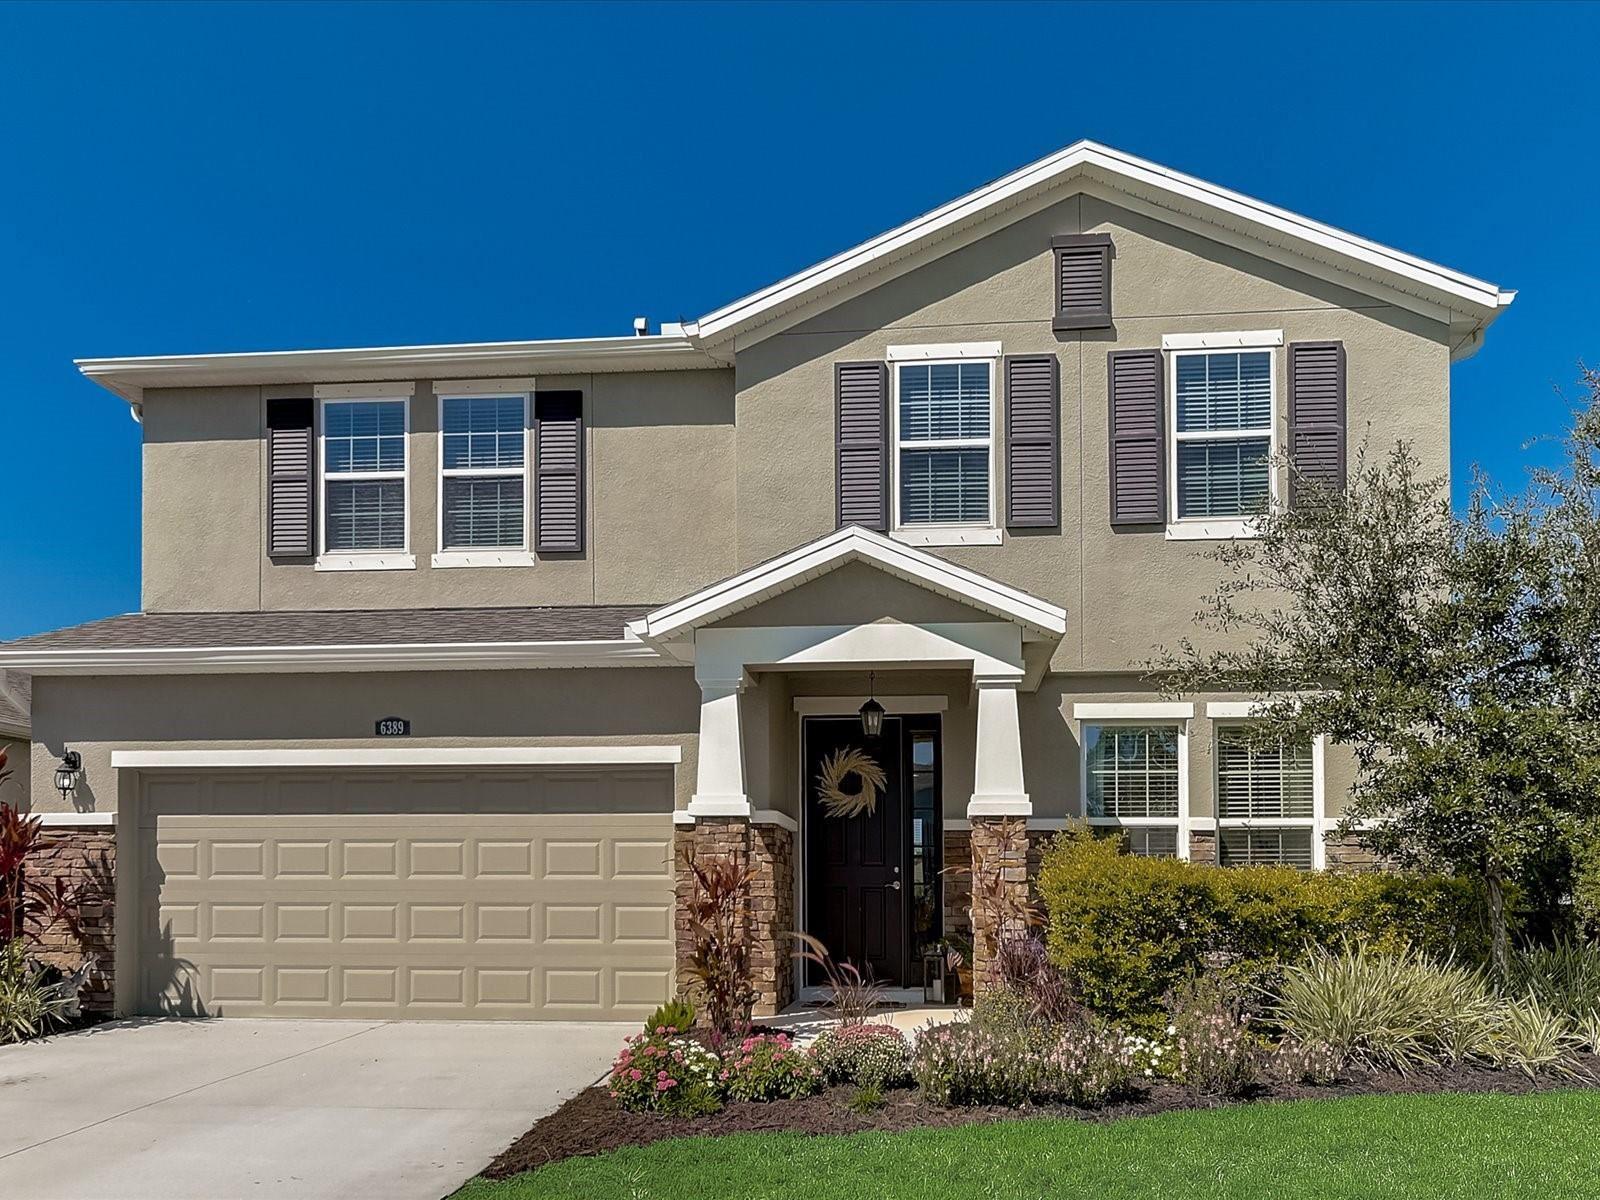 6389 MIGHTY EAGLE WAY, Sarasota, FL 34241 - #: A4513894